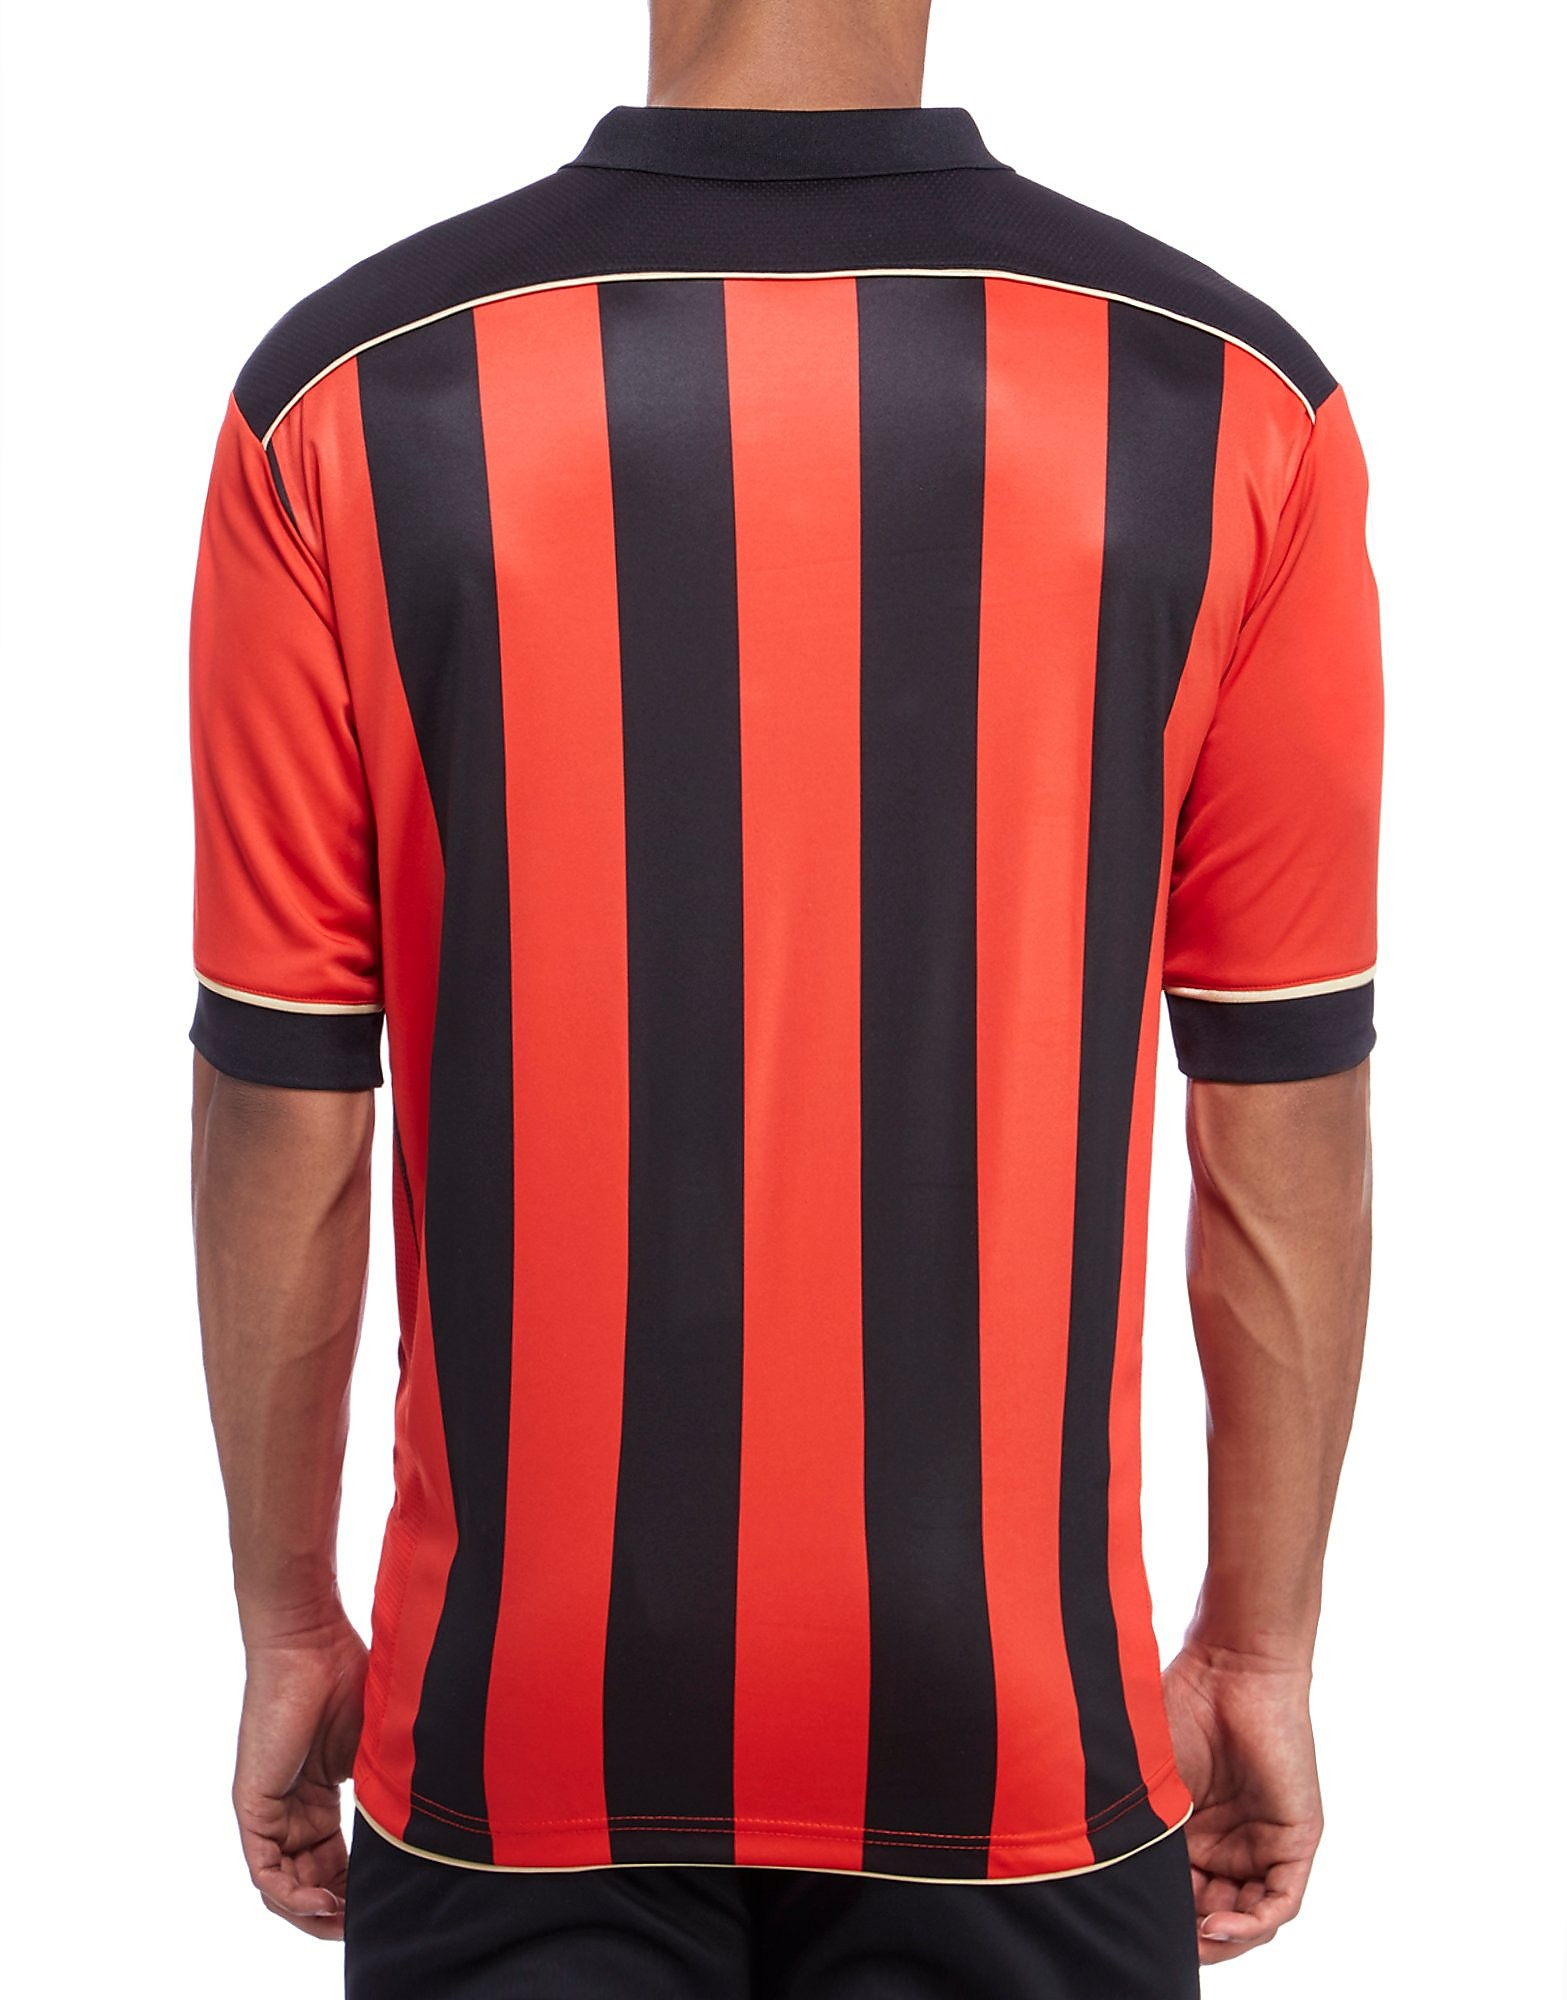 JD AFC Bournemouth 2016/17 Home Shirt